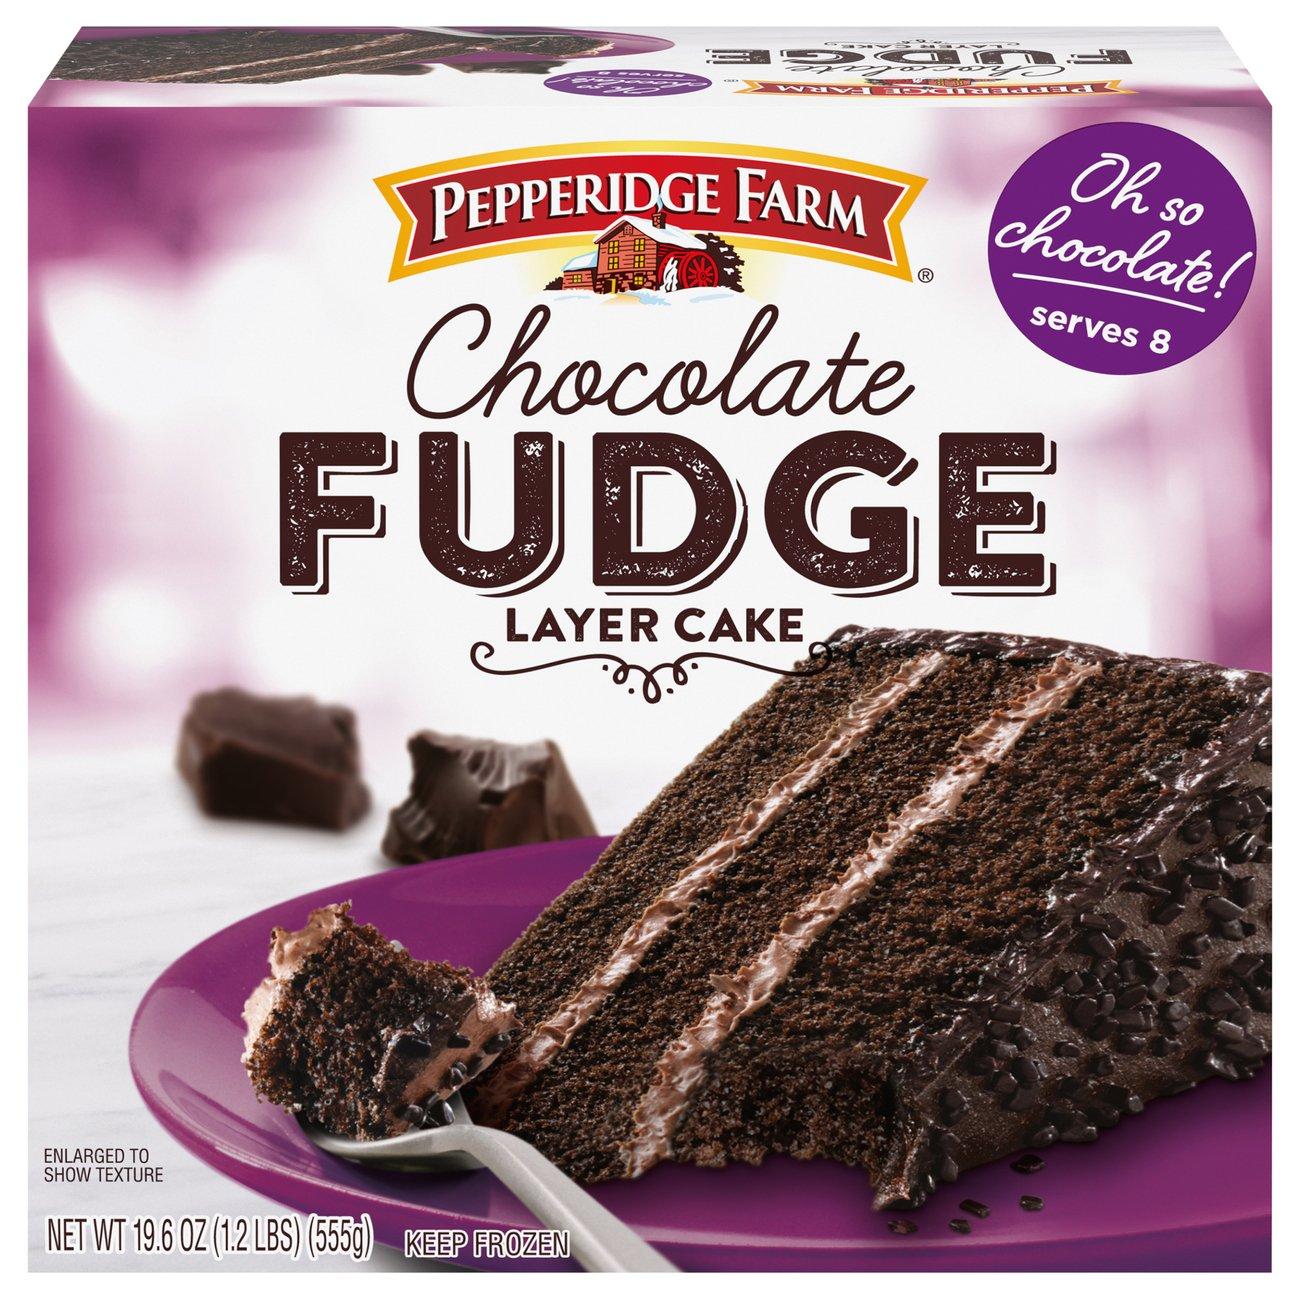 Pepperidge Farm Chocolate Fudge 3 Layer Cake Shop Desserts Pastries At H E B